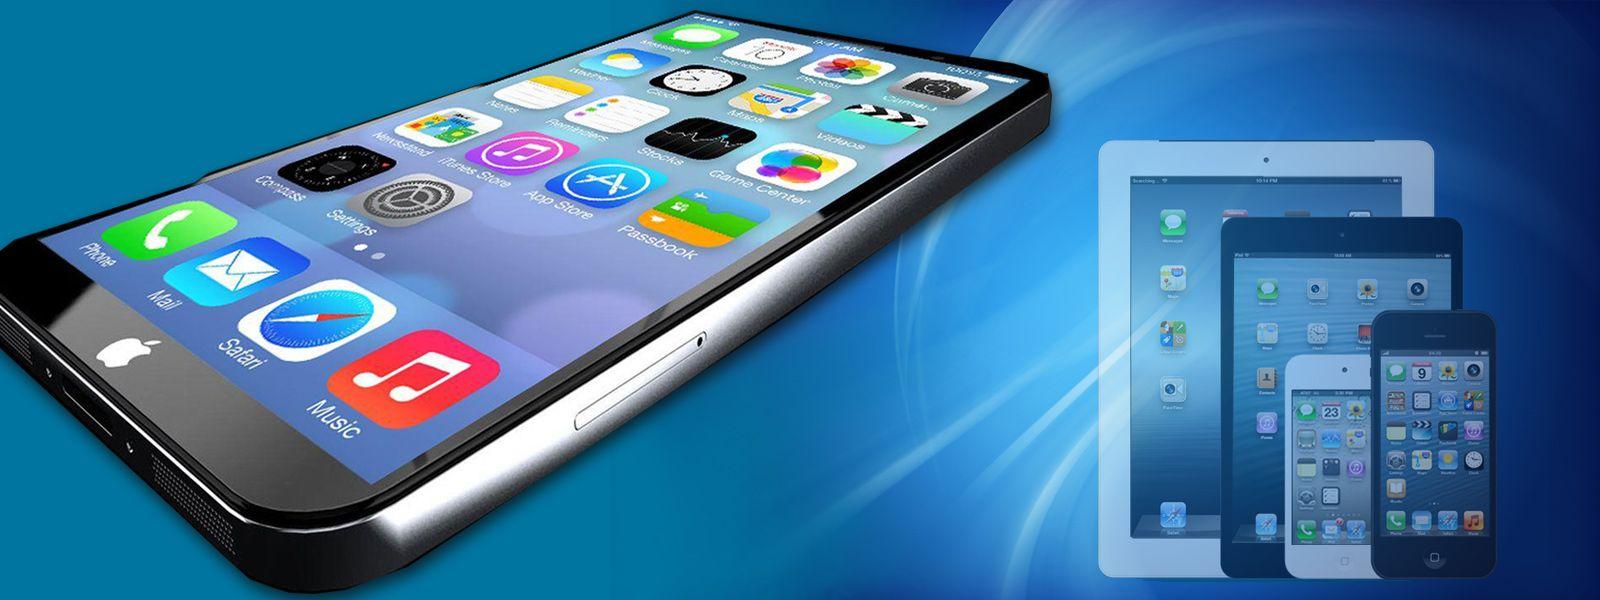 iphone 7 plus unlocked amazon usa (con immagini)